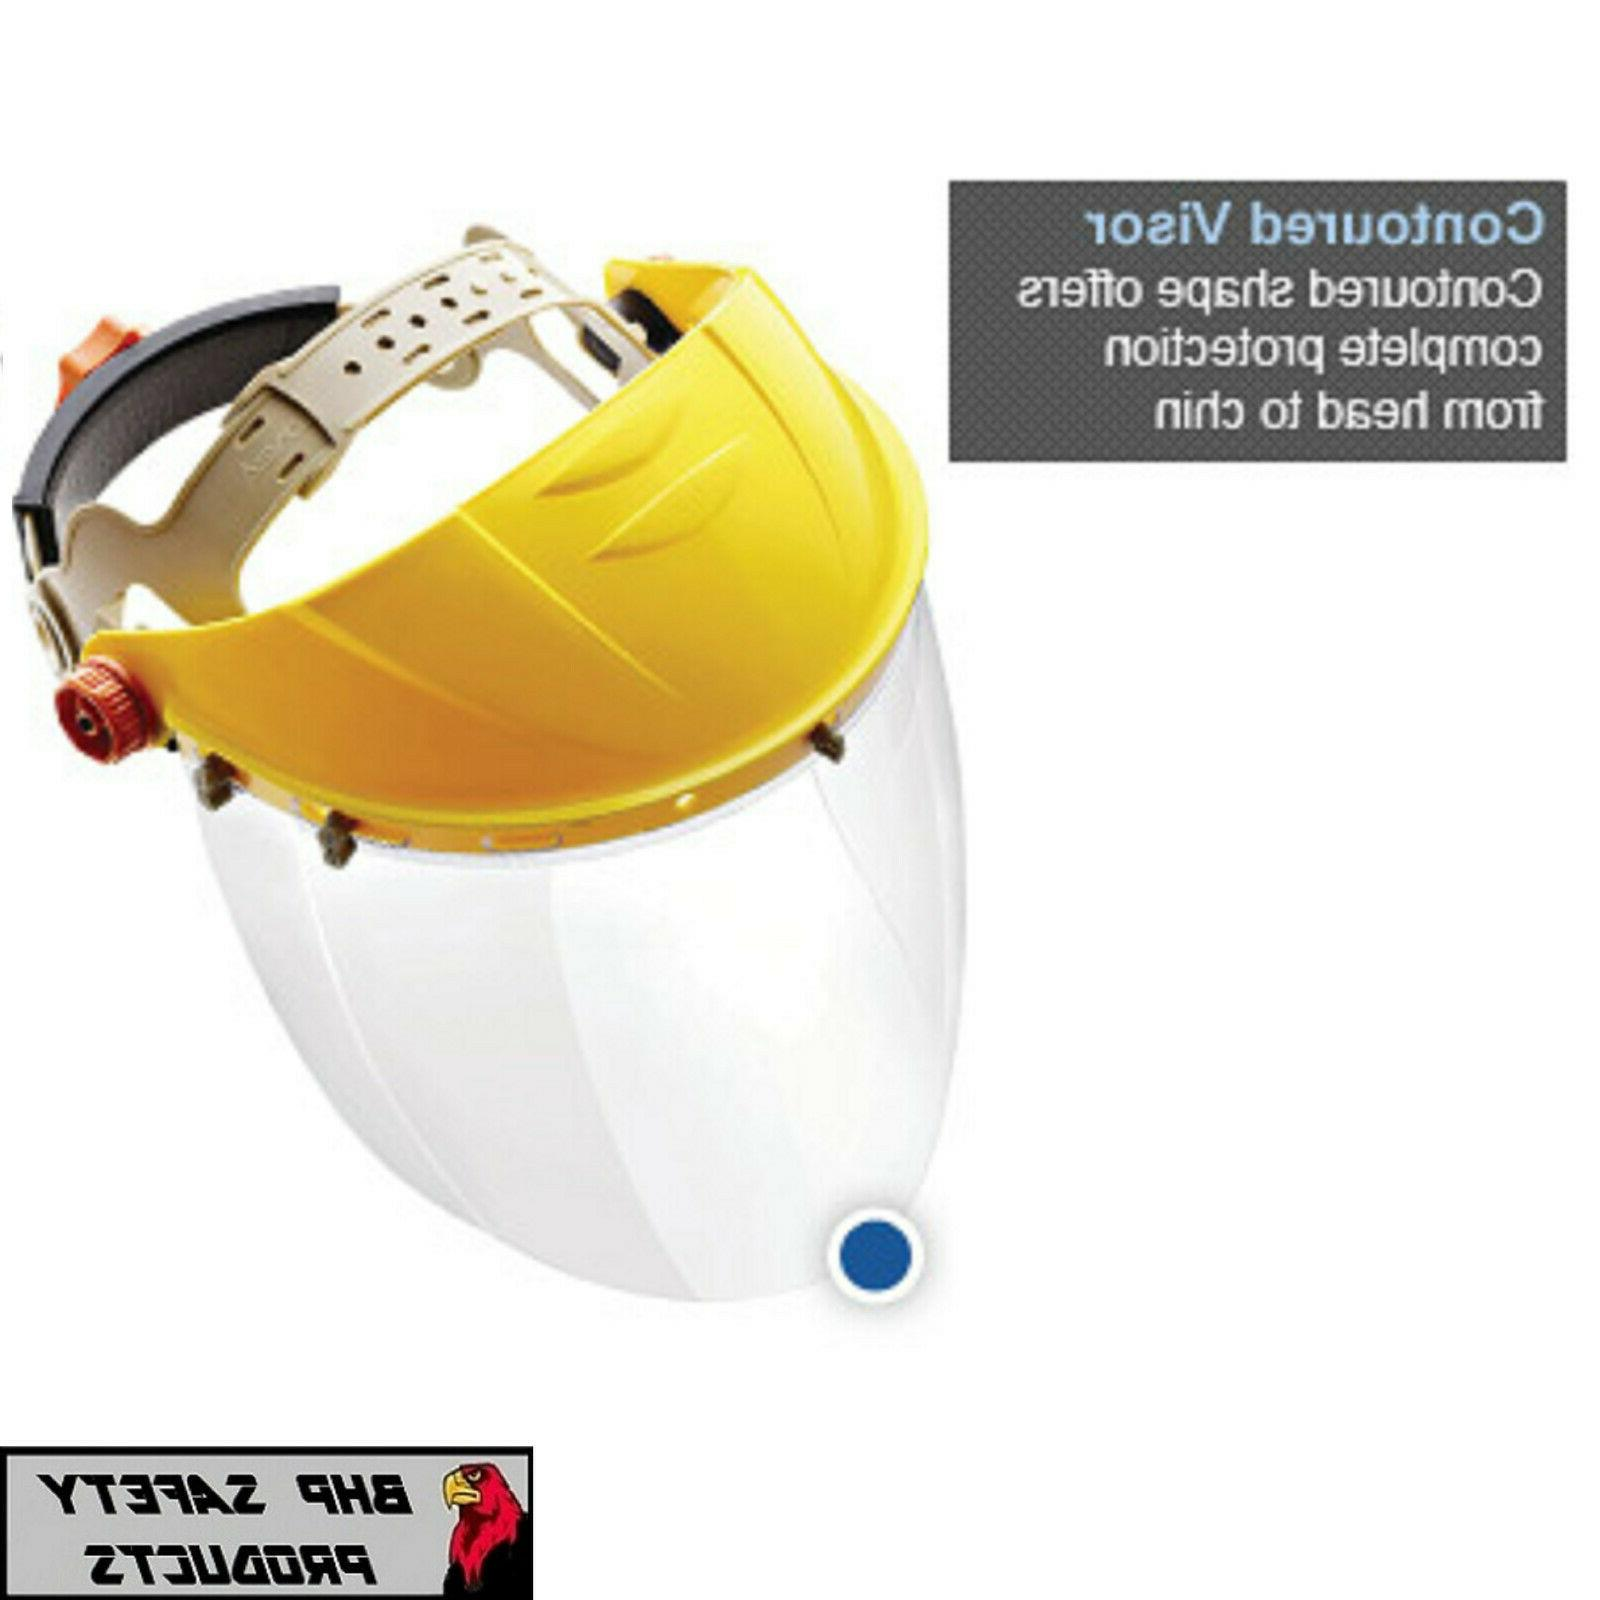 Full Shield Tool Mask